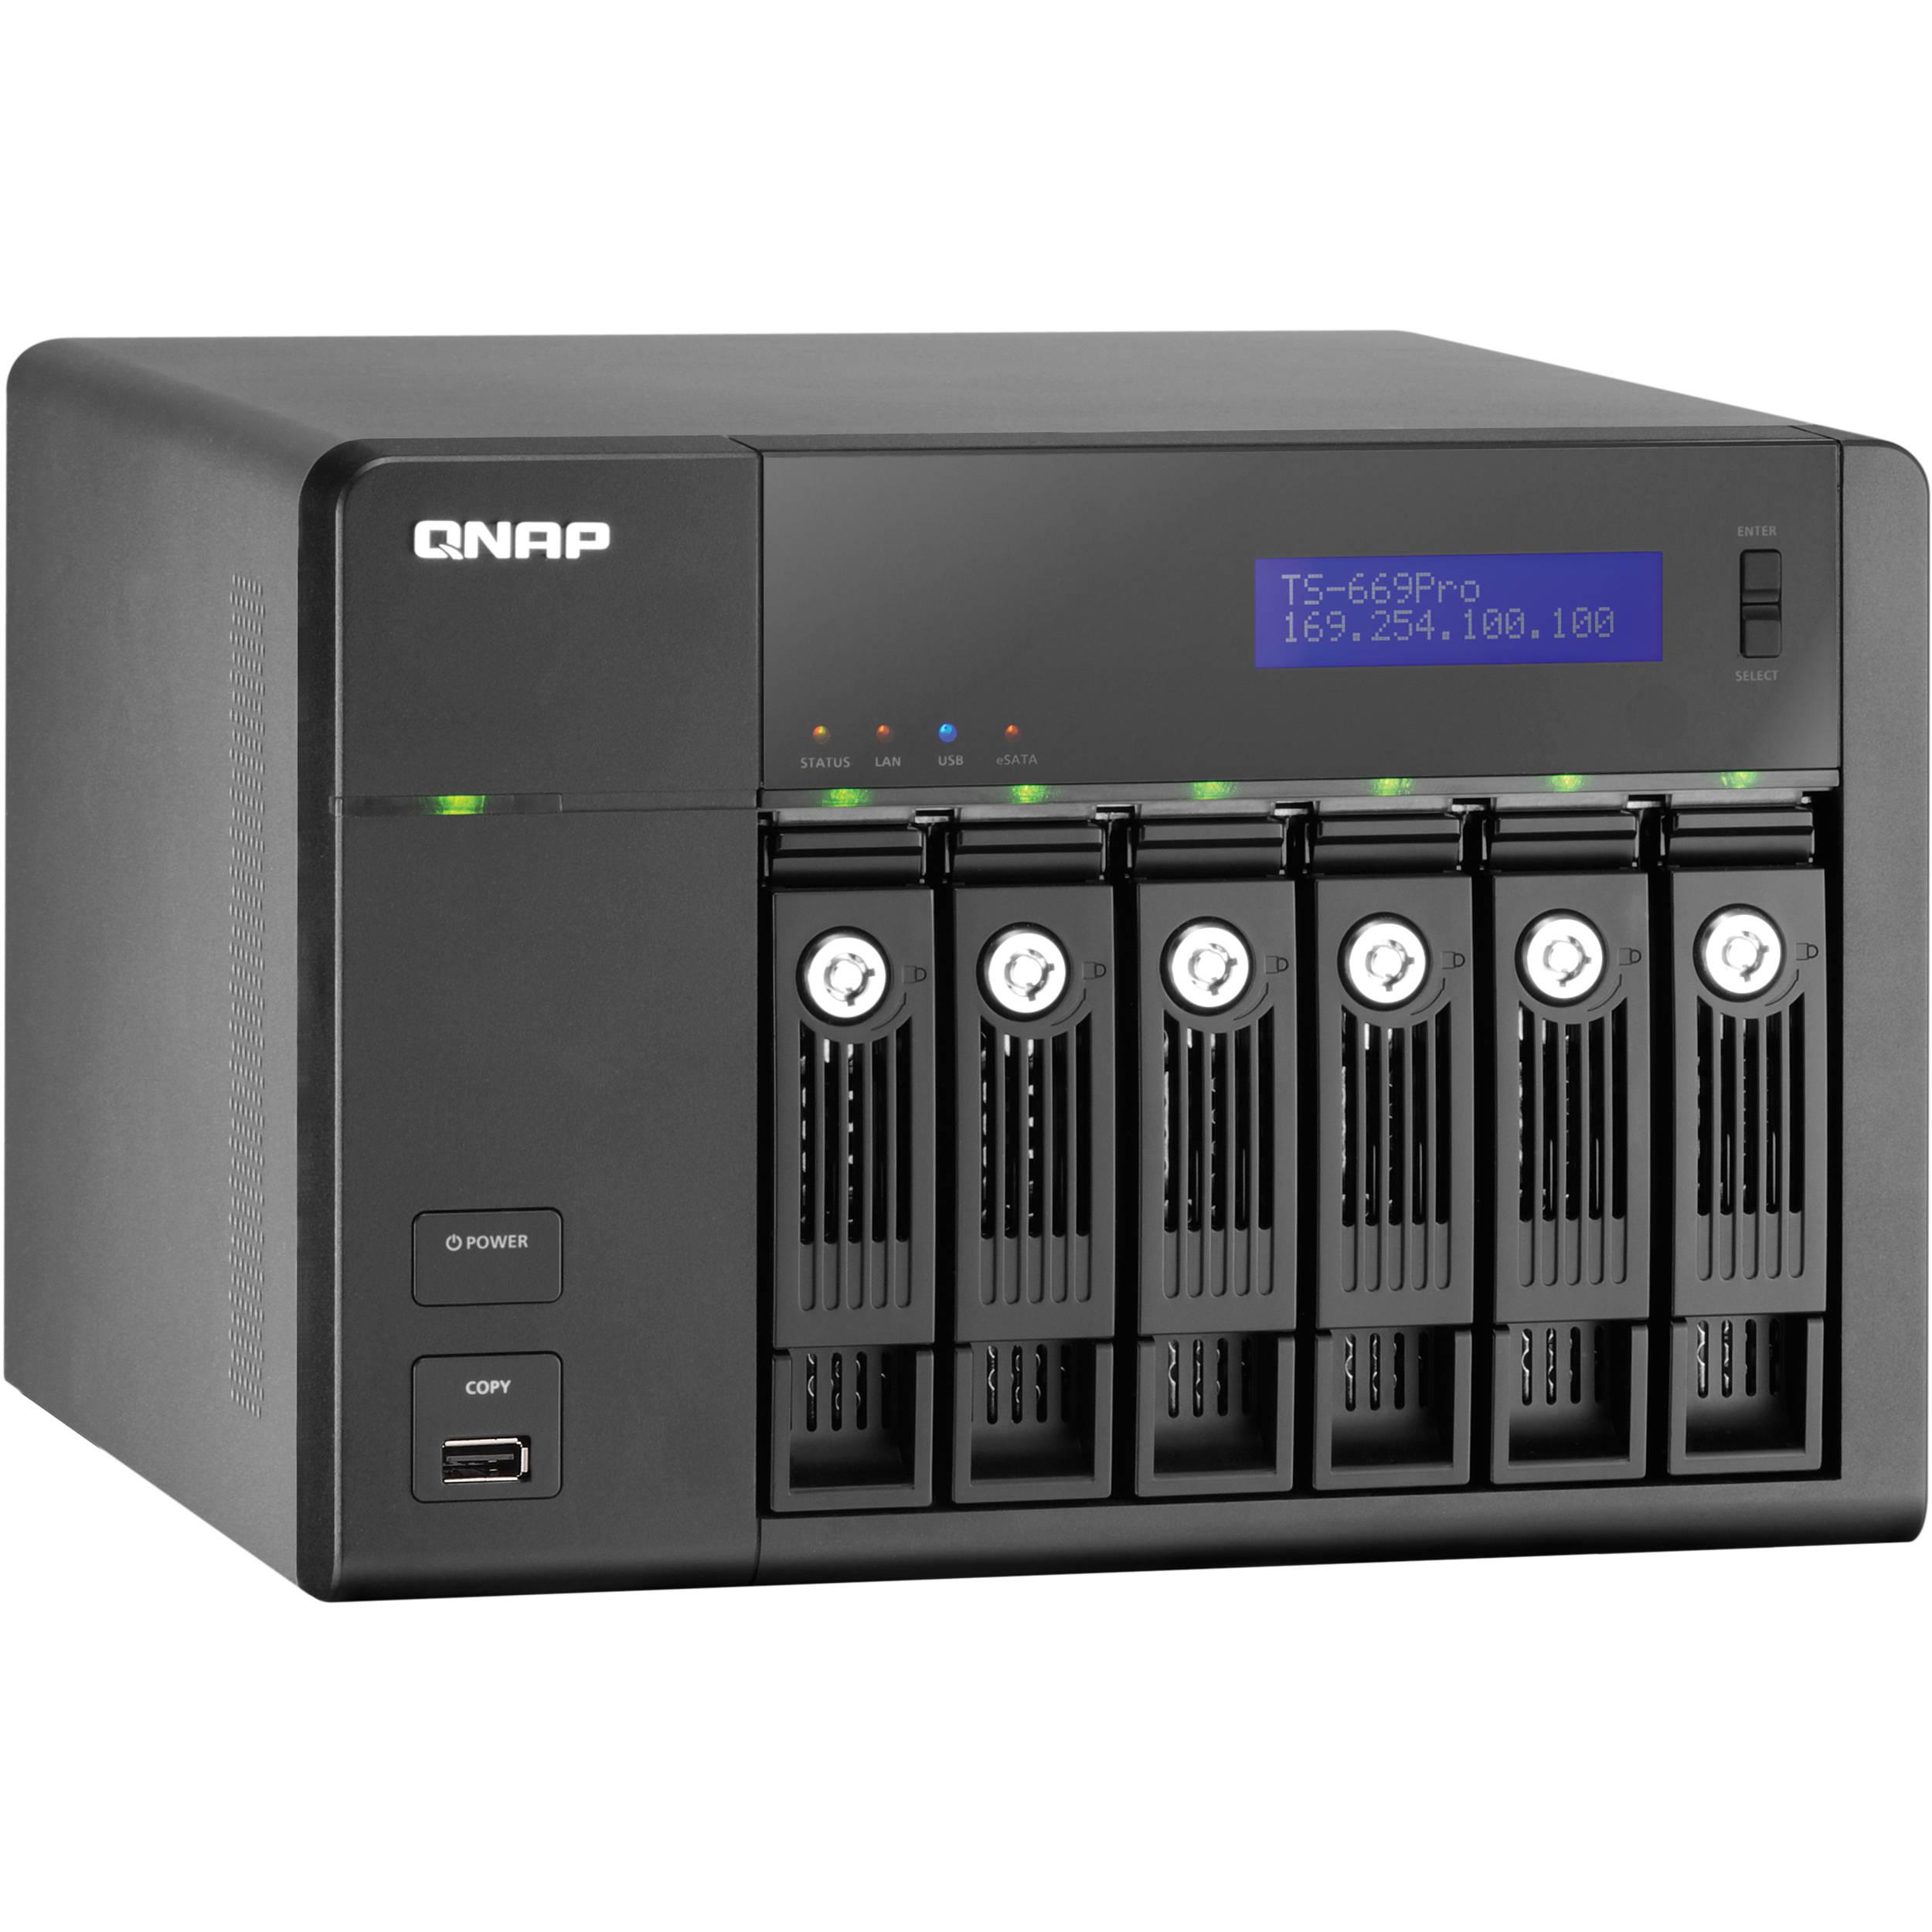 QNAP TS-669 Pro 6 Bay Turbo NAS Server for SMBs